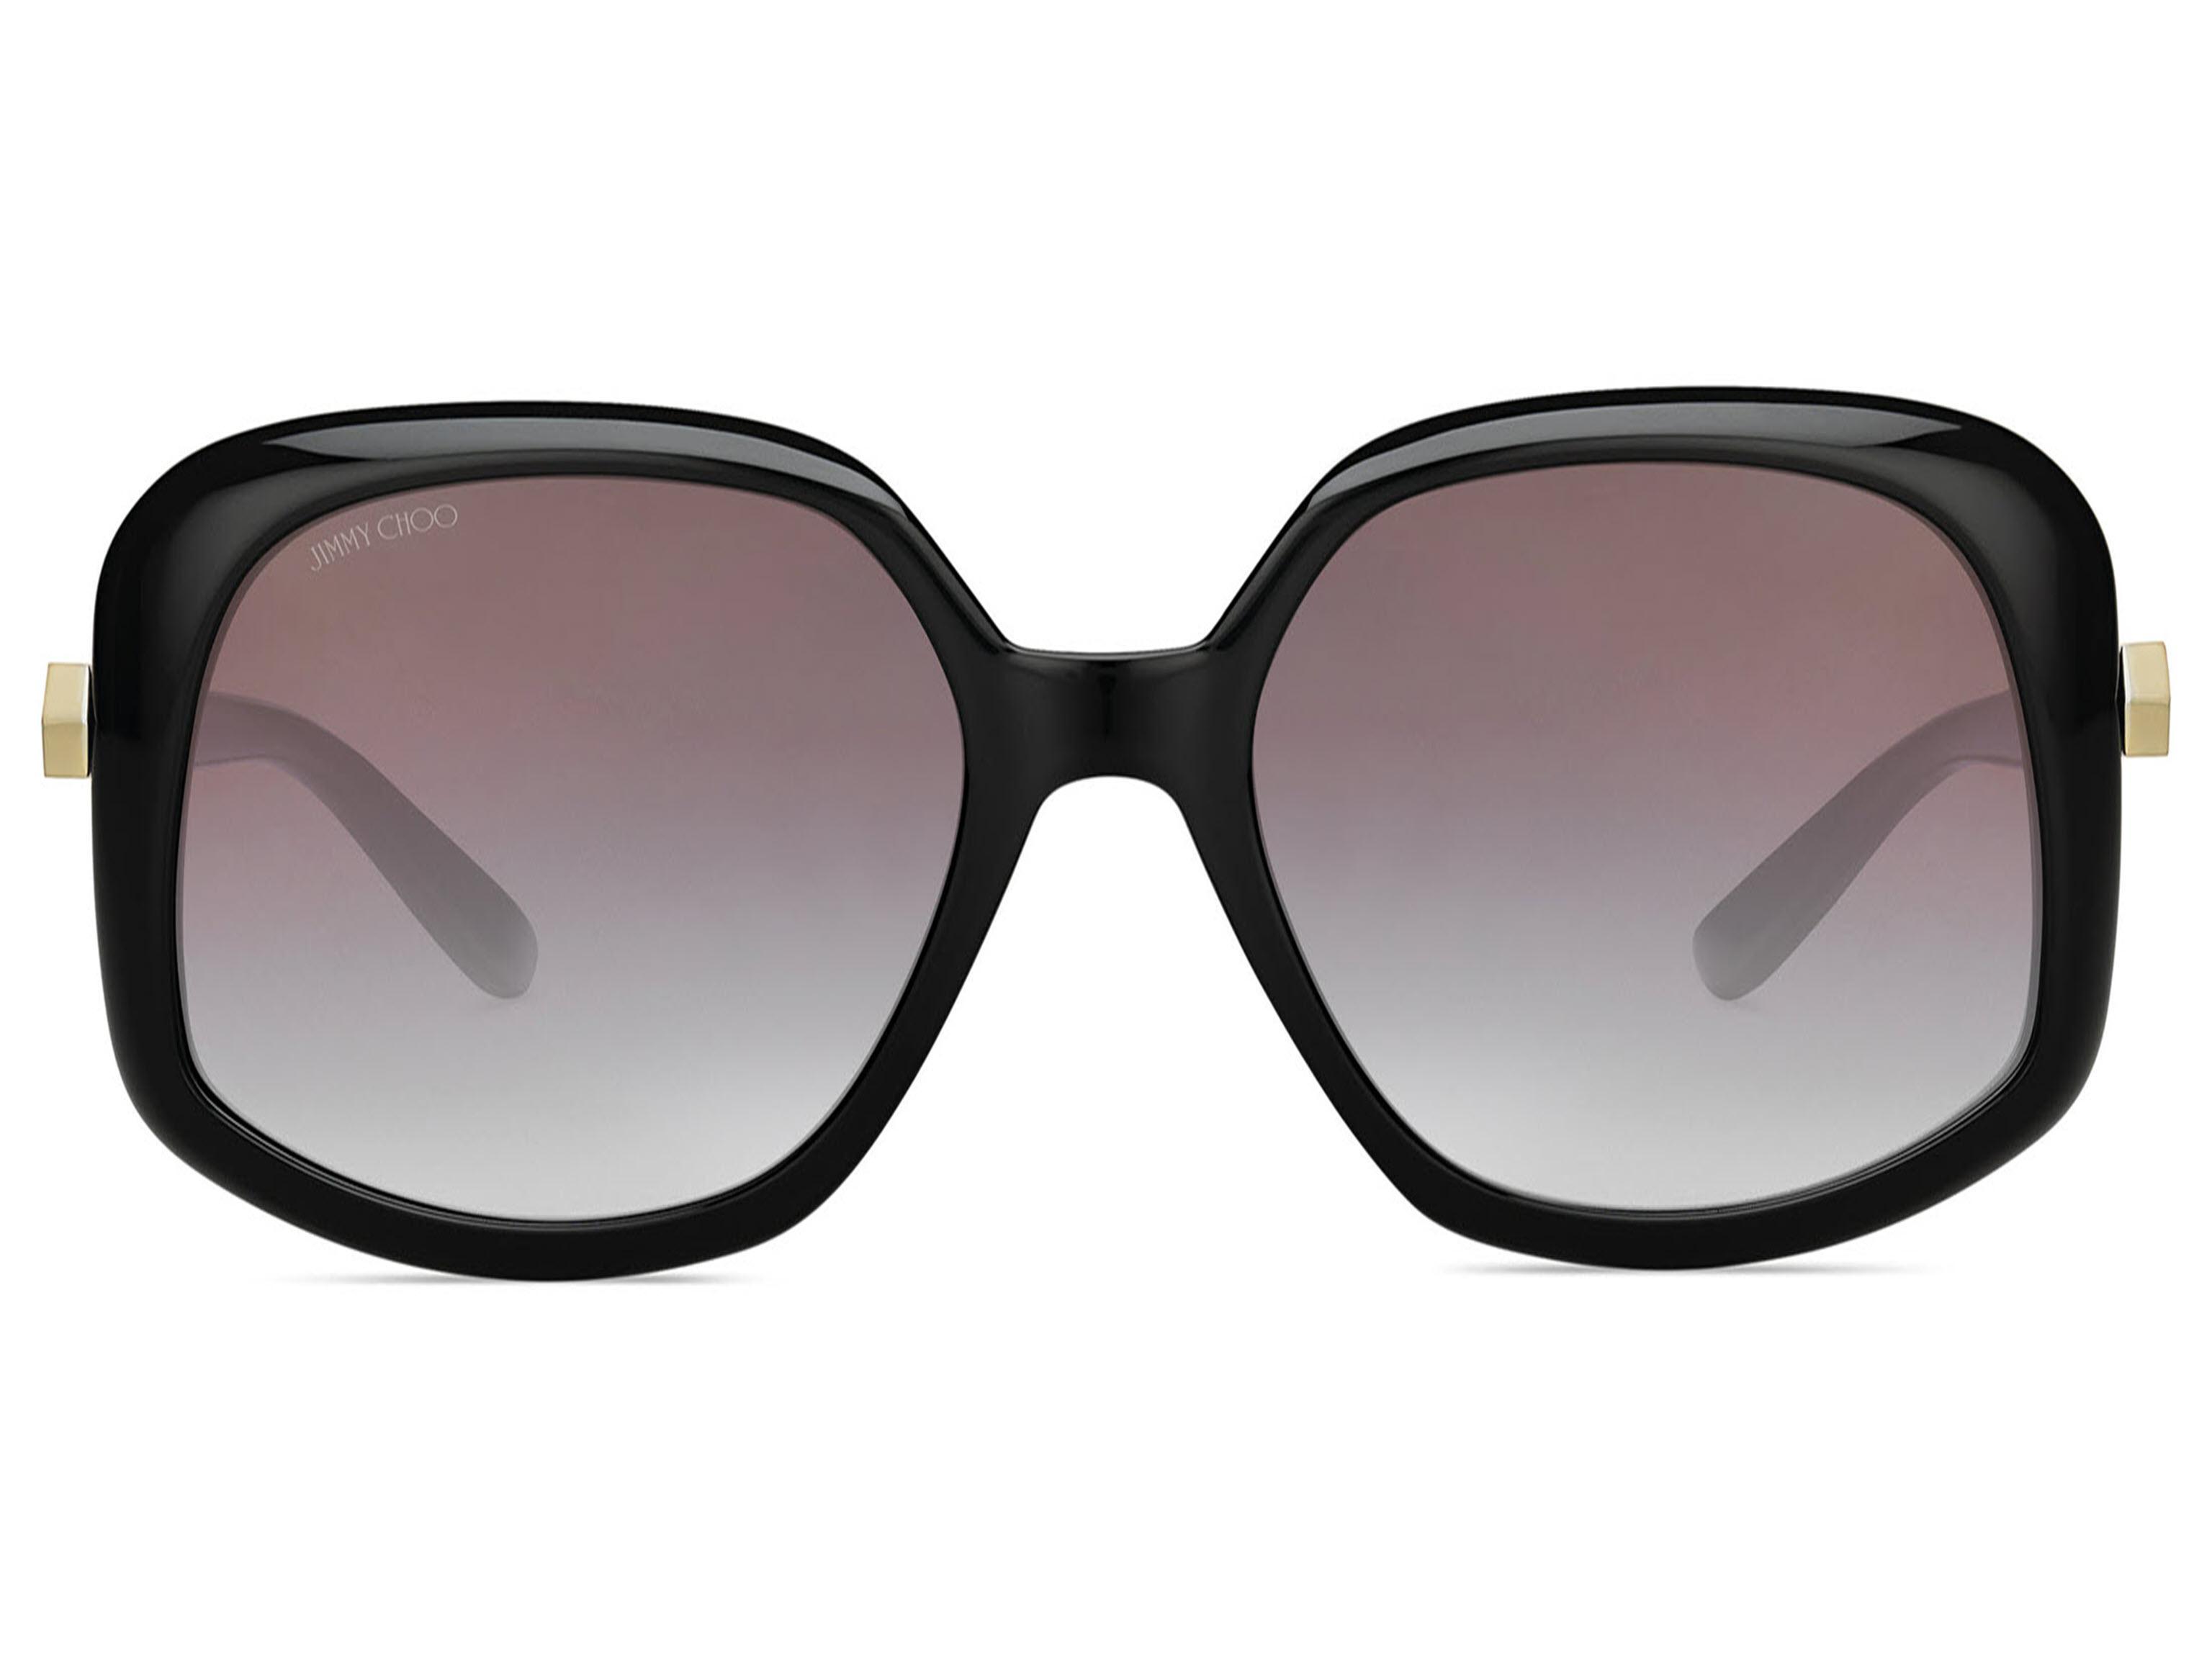 92ec7ddbbad13 Lyst - Jimmy Choo Amada s Rectangle Sunglasses in Brown